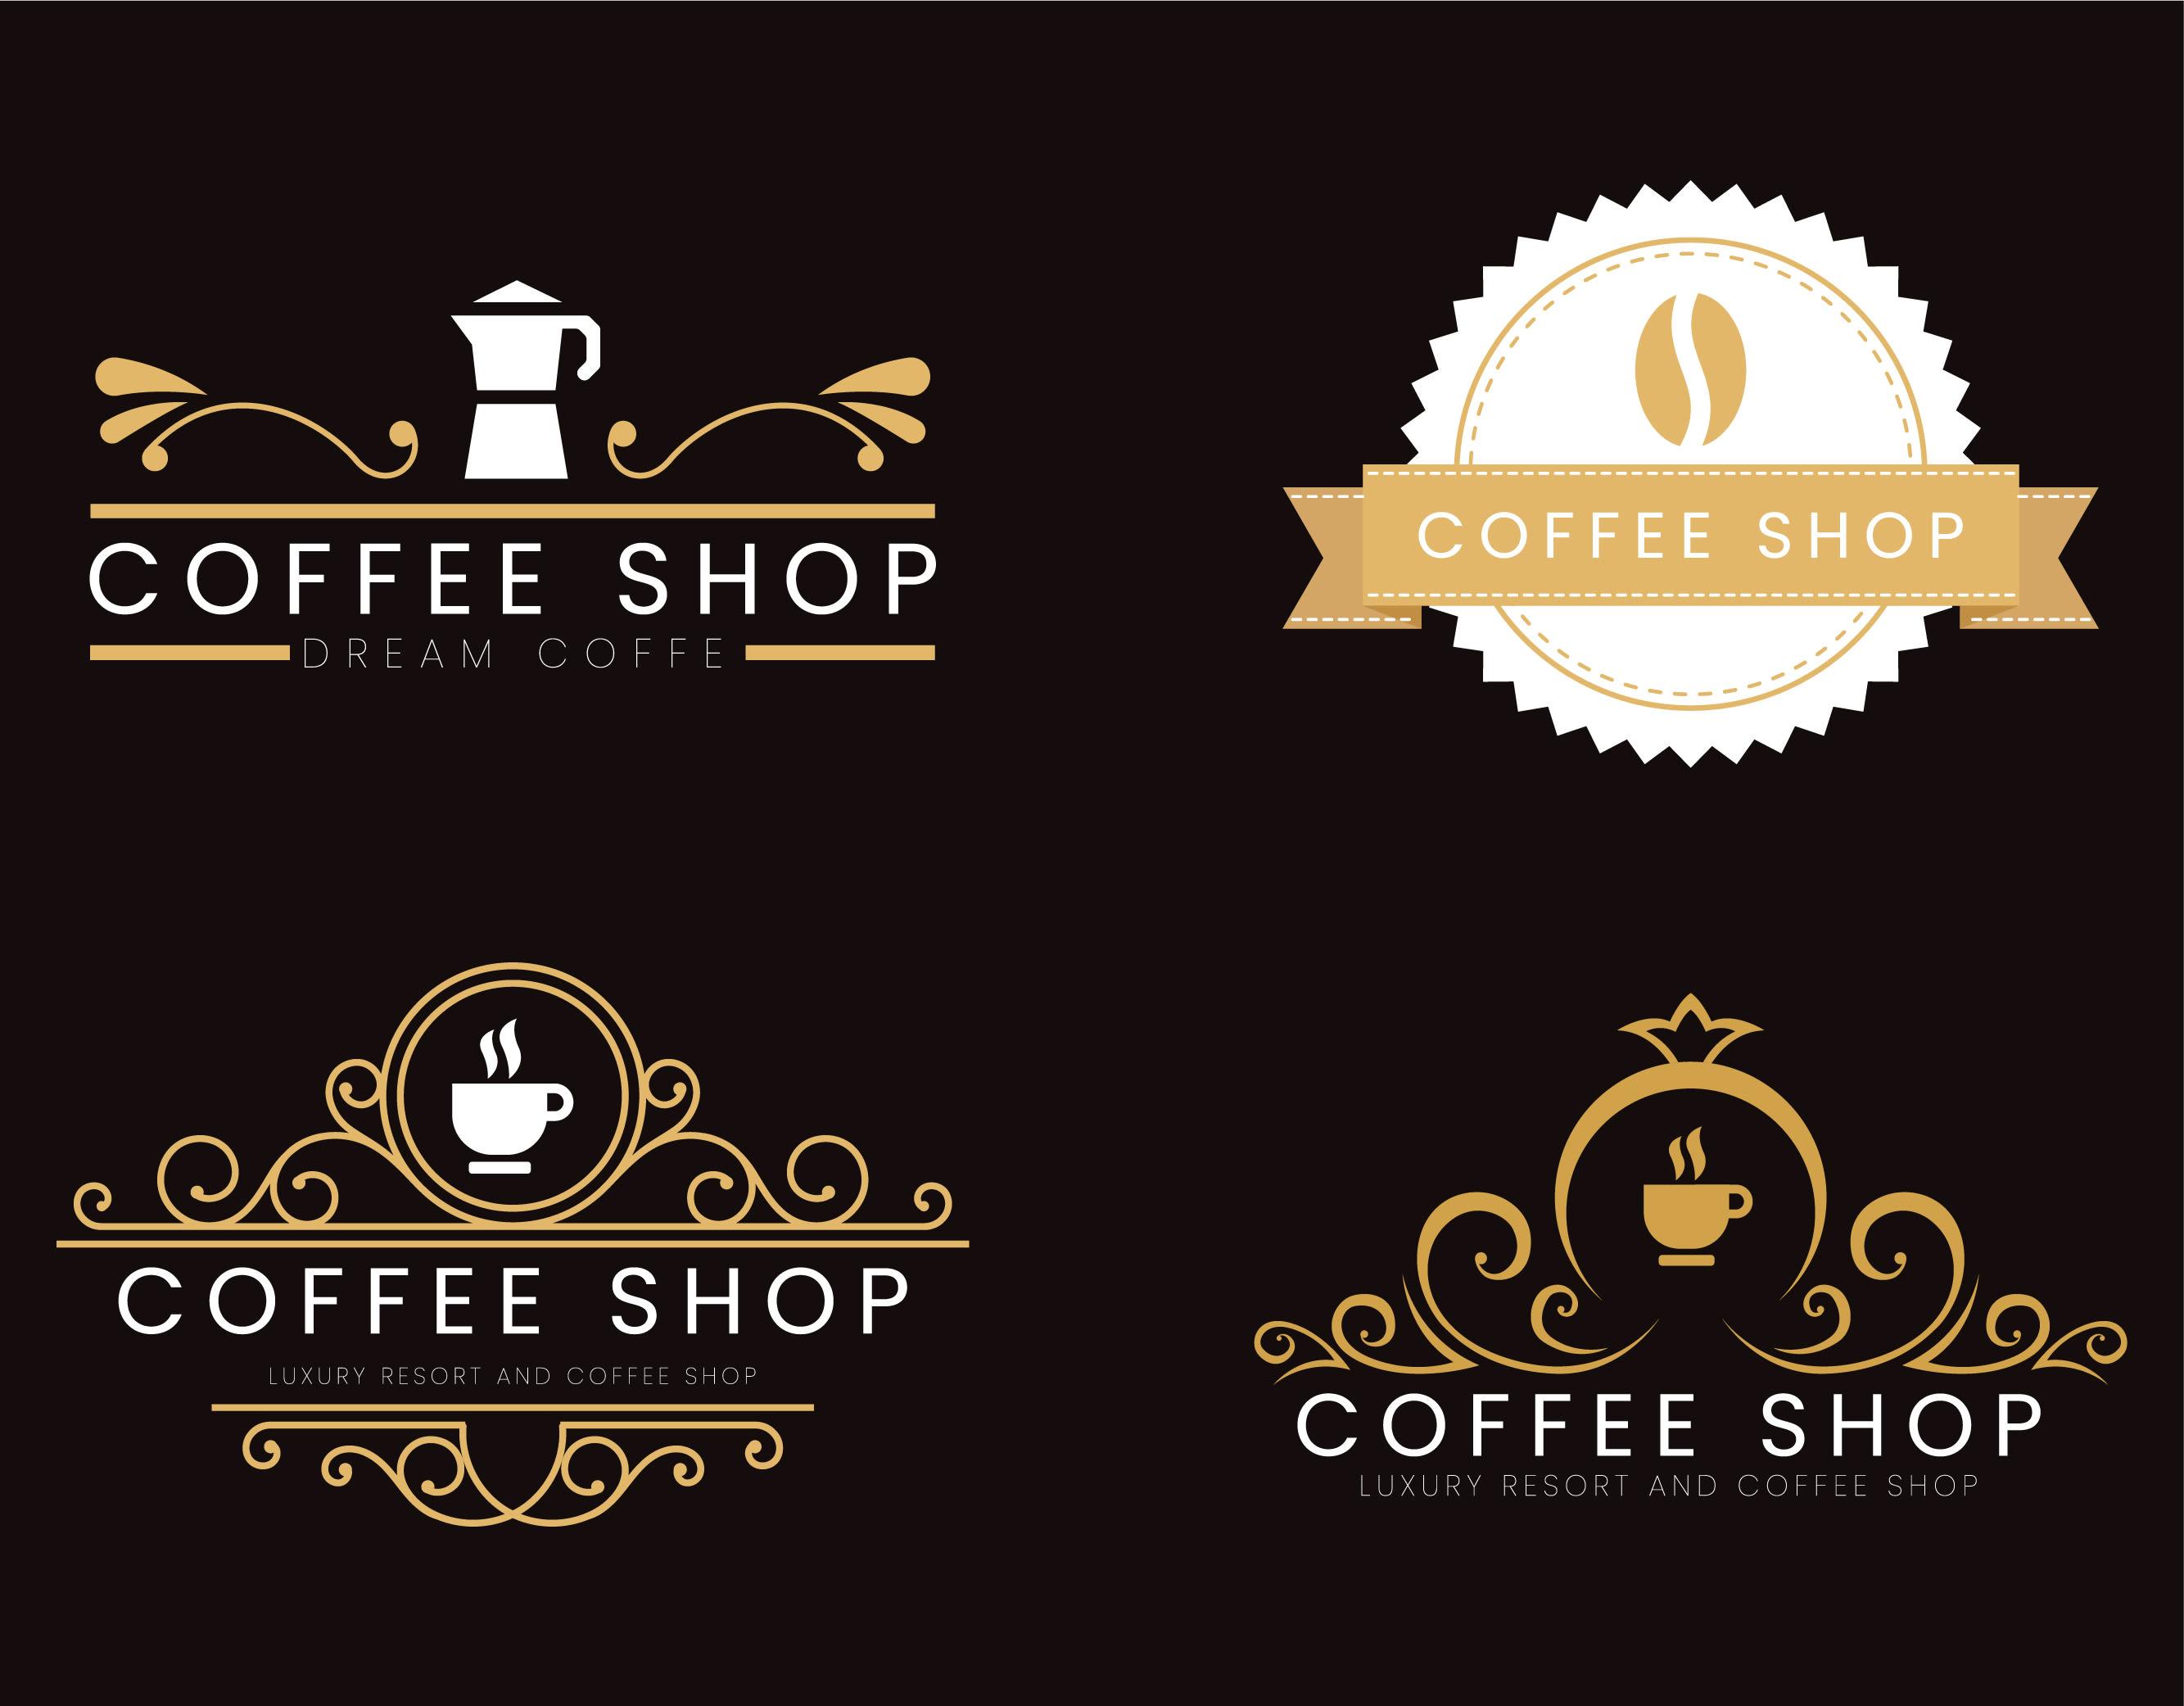 Do Design Modern Food Restaurant Coffee Shop And Cafe Logo By Zahangiralam404